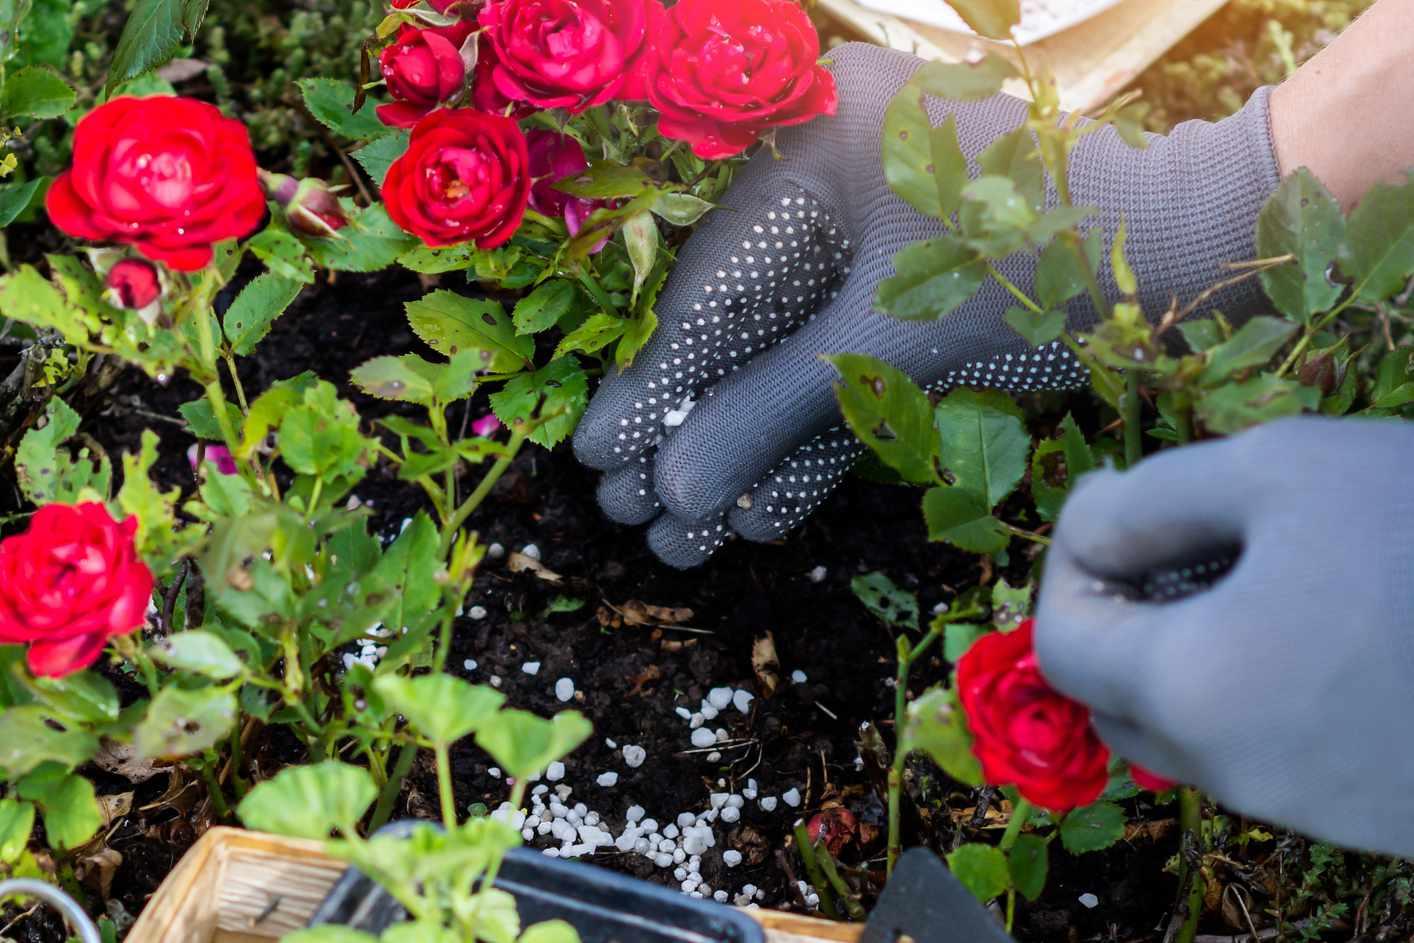 Applying granular fertilizer to the base of the plant